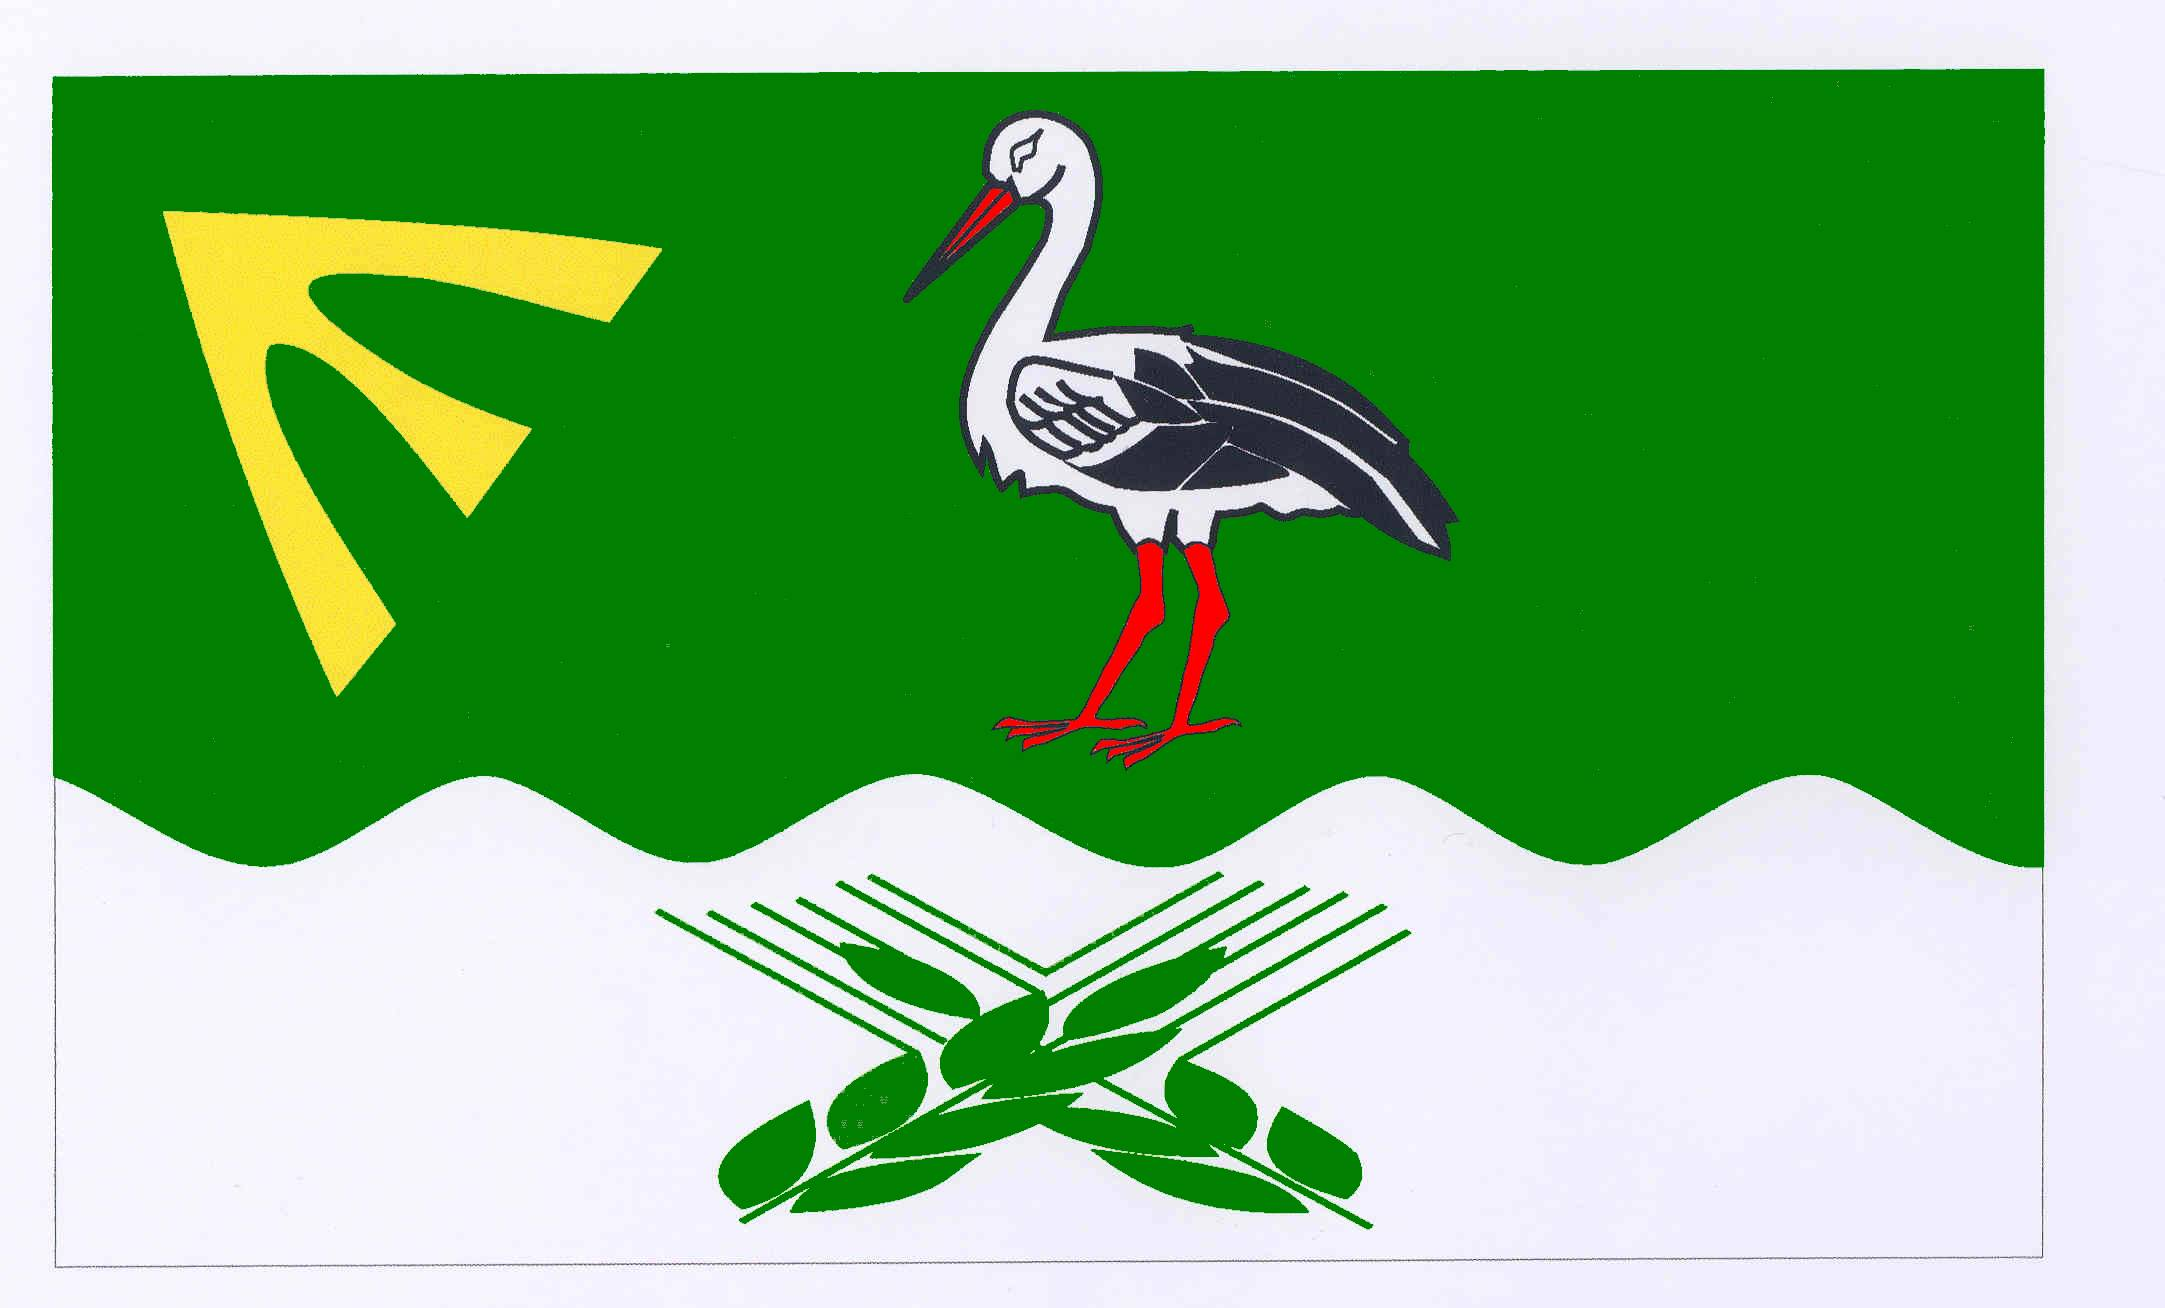 Flagge GemeindeKlempau, Kreis Herzogtum Lauenburg